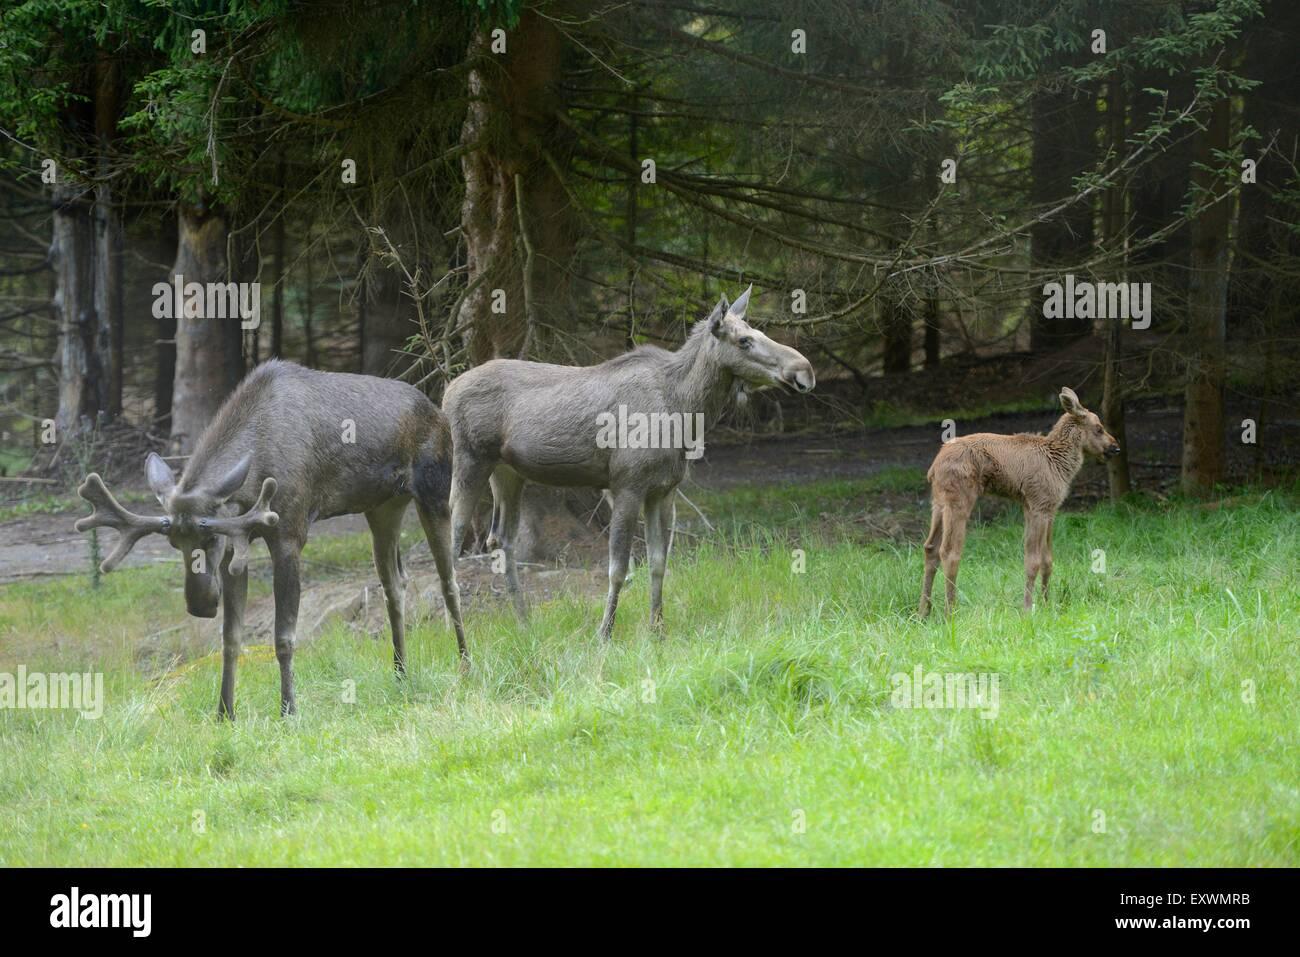 Elk family in Bavarian Forest, Germany - Stock Image